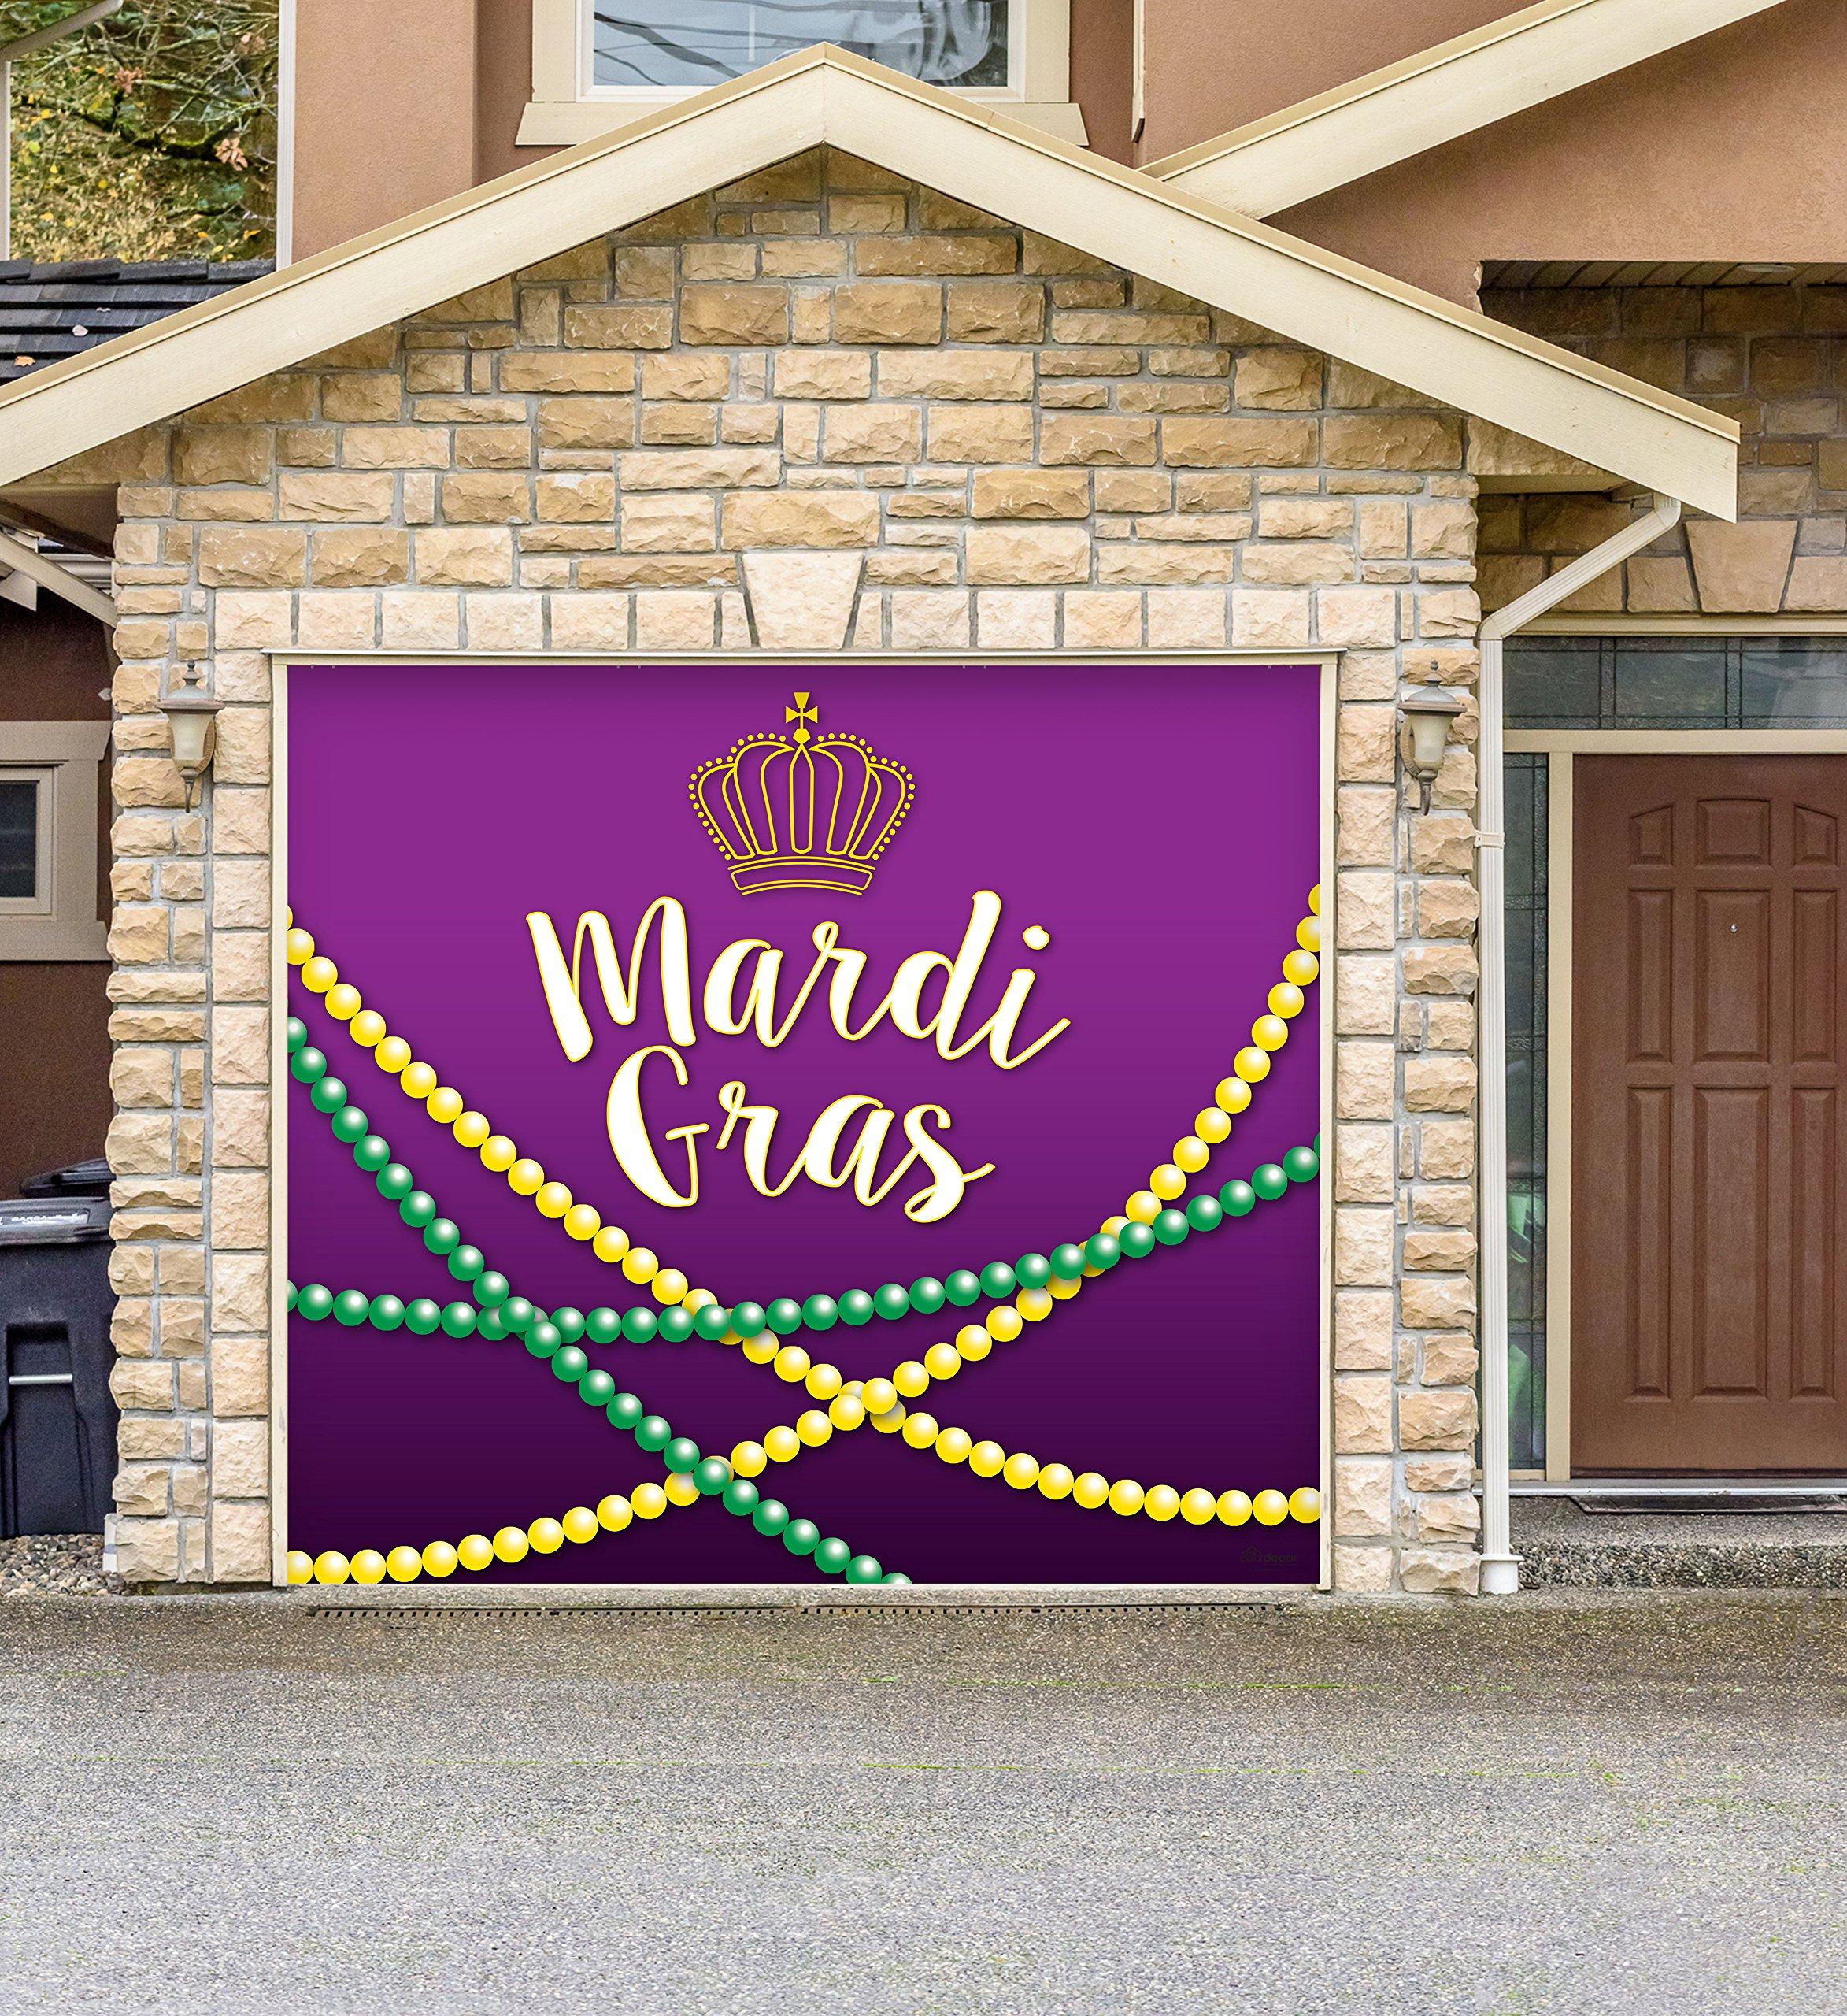 Outdoor Mardi Gras Decorations Garage Door Banner Cover Mural Décoration 8'x9' - Mardi Gras Beads - ''The Original Mardi Gras Supplies Holiday Garage Door Banner Decor''